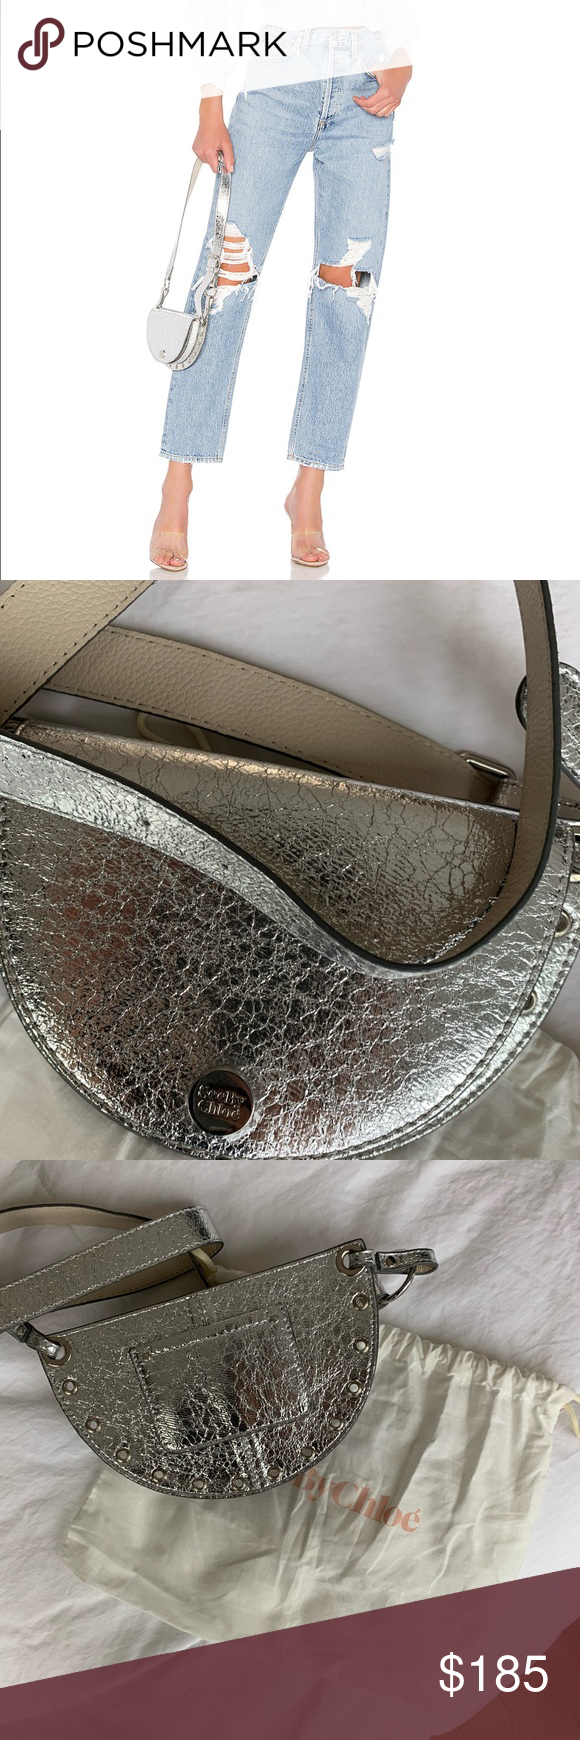 See by Chloe Metallic Belt Bag Brand new. Never been worn! See By Chloe Bags Mini Bags #seebychloe